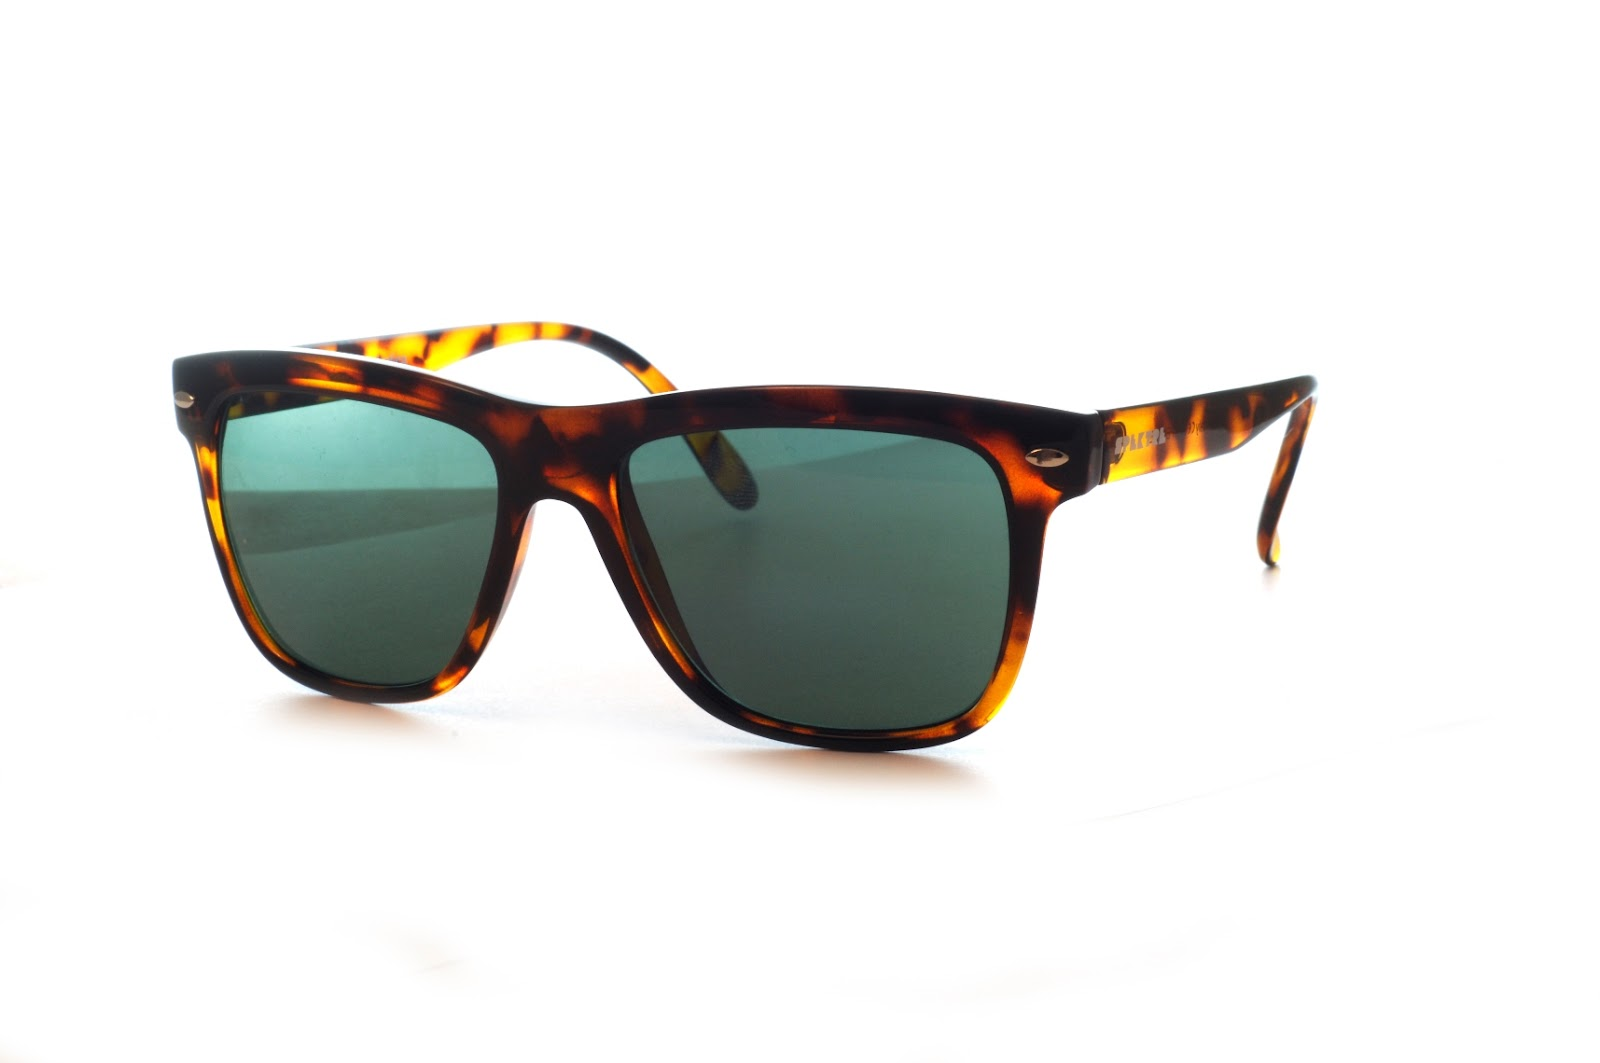 Sunglasses Spring